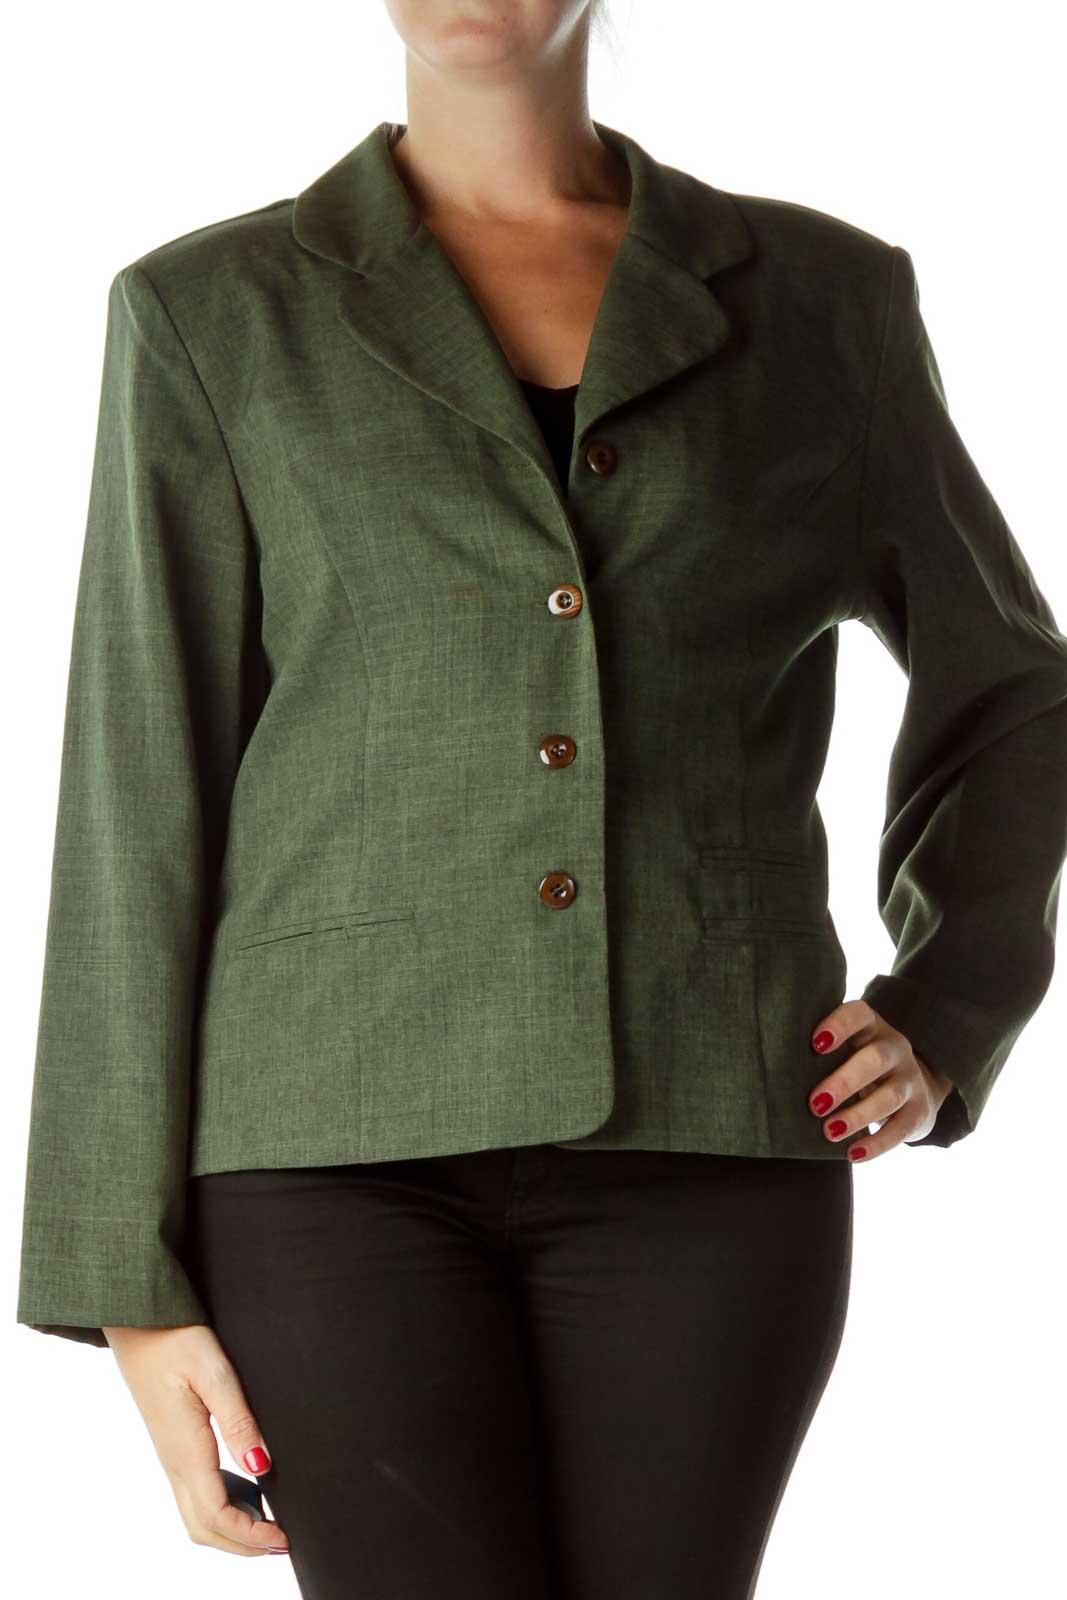 Green Textured Suit Jacket Front